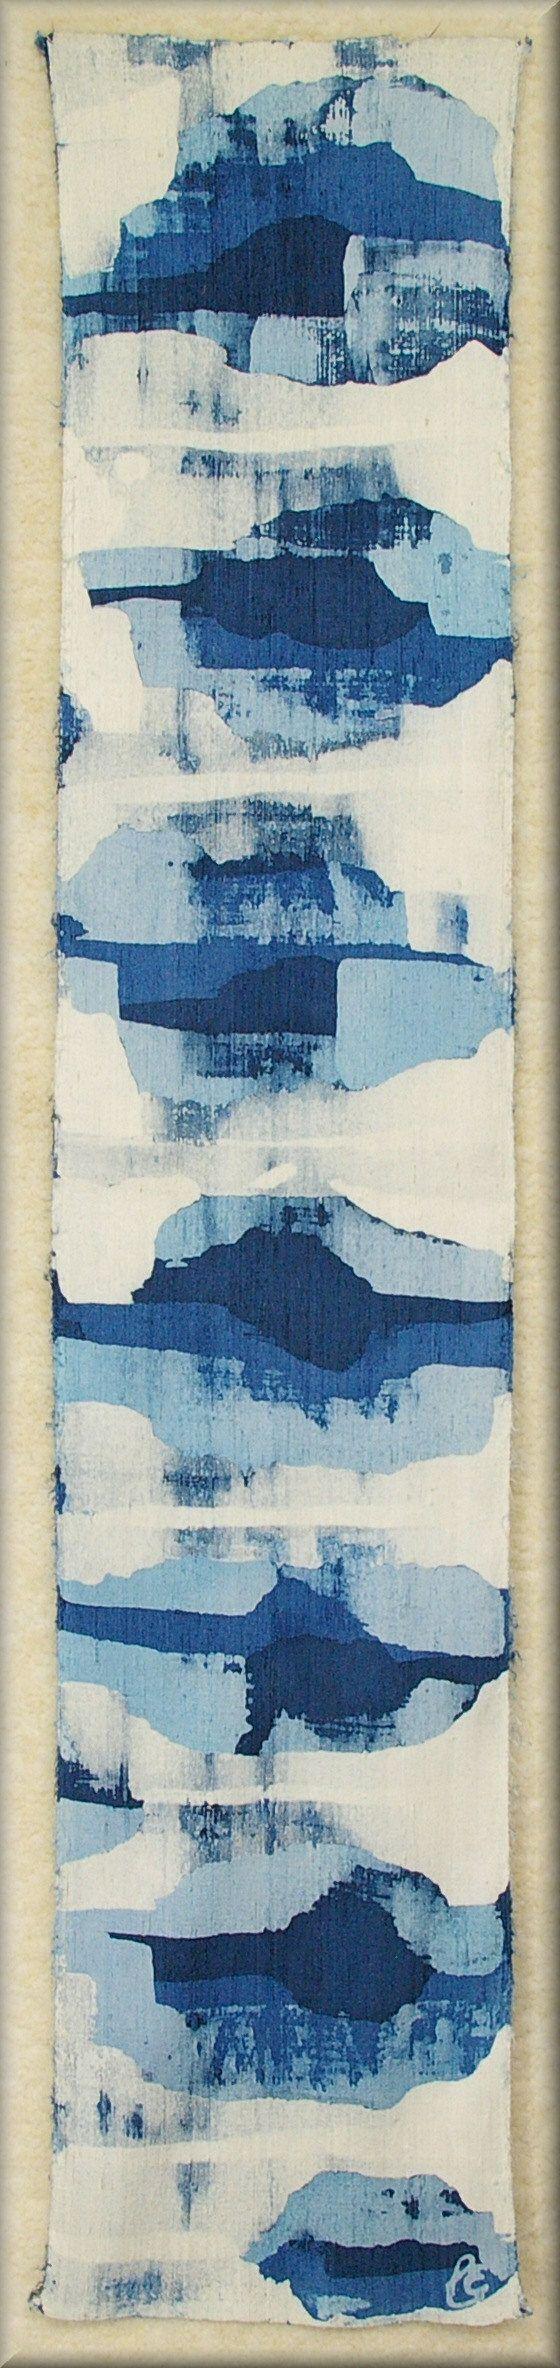 "Snow Melting on a Blue Creek - Thick Dupioni Silk Unisex Scarf (approx. 11x54 inches) Hand dyed by Laura Elderton ""SilkinArt""  https://www.etsy.com/shop/lauraelderton"